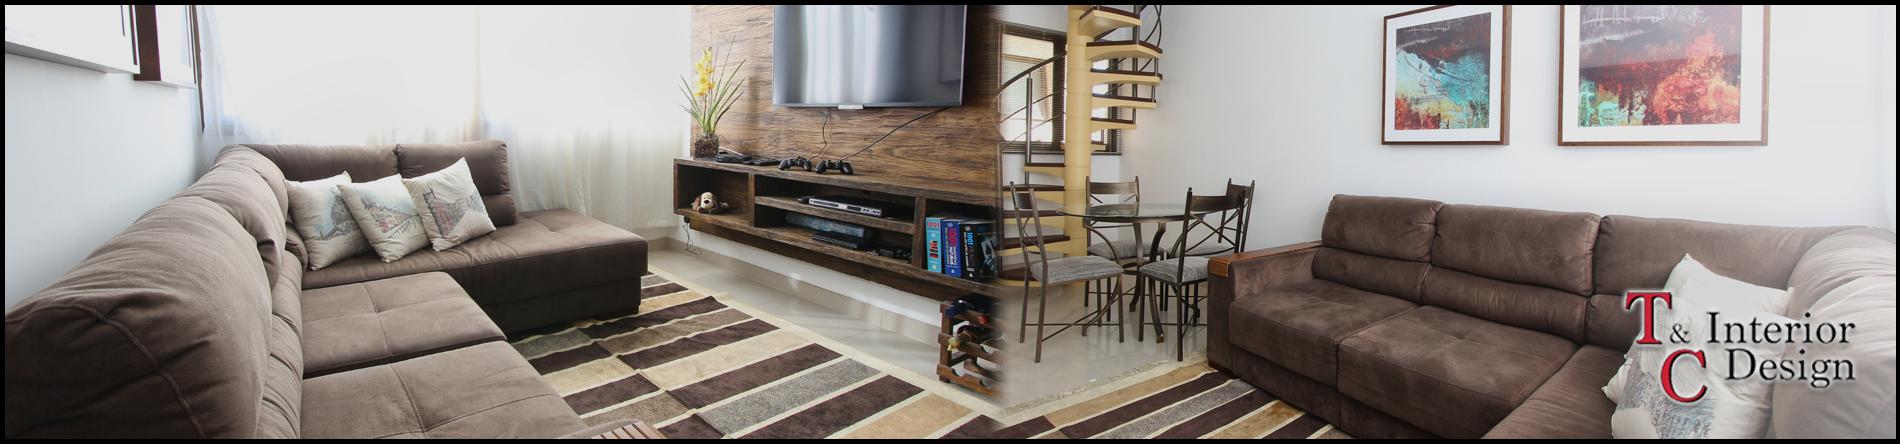 T C Interior Design Is An Interior Design Firm In Colorado Springs Co